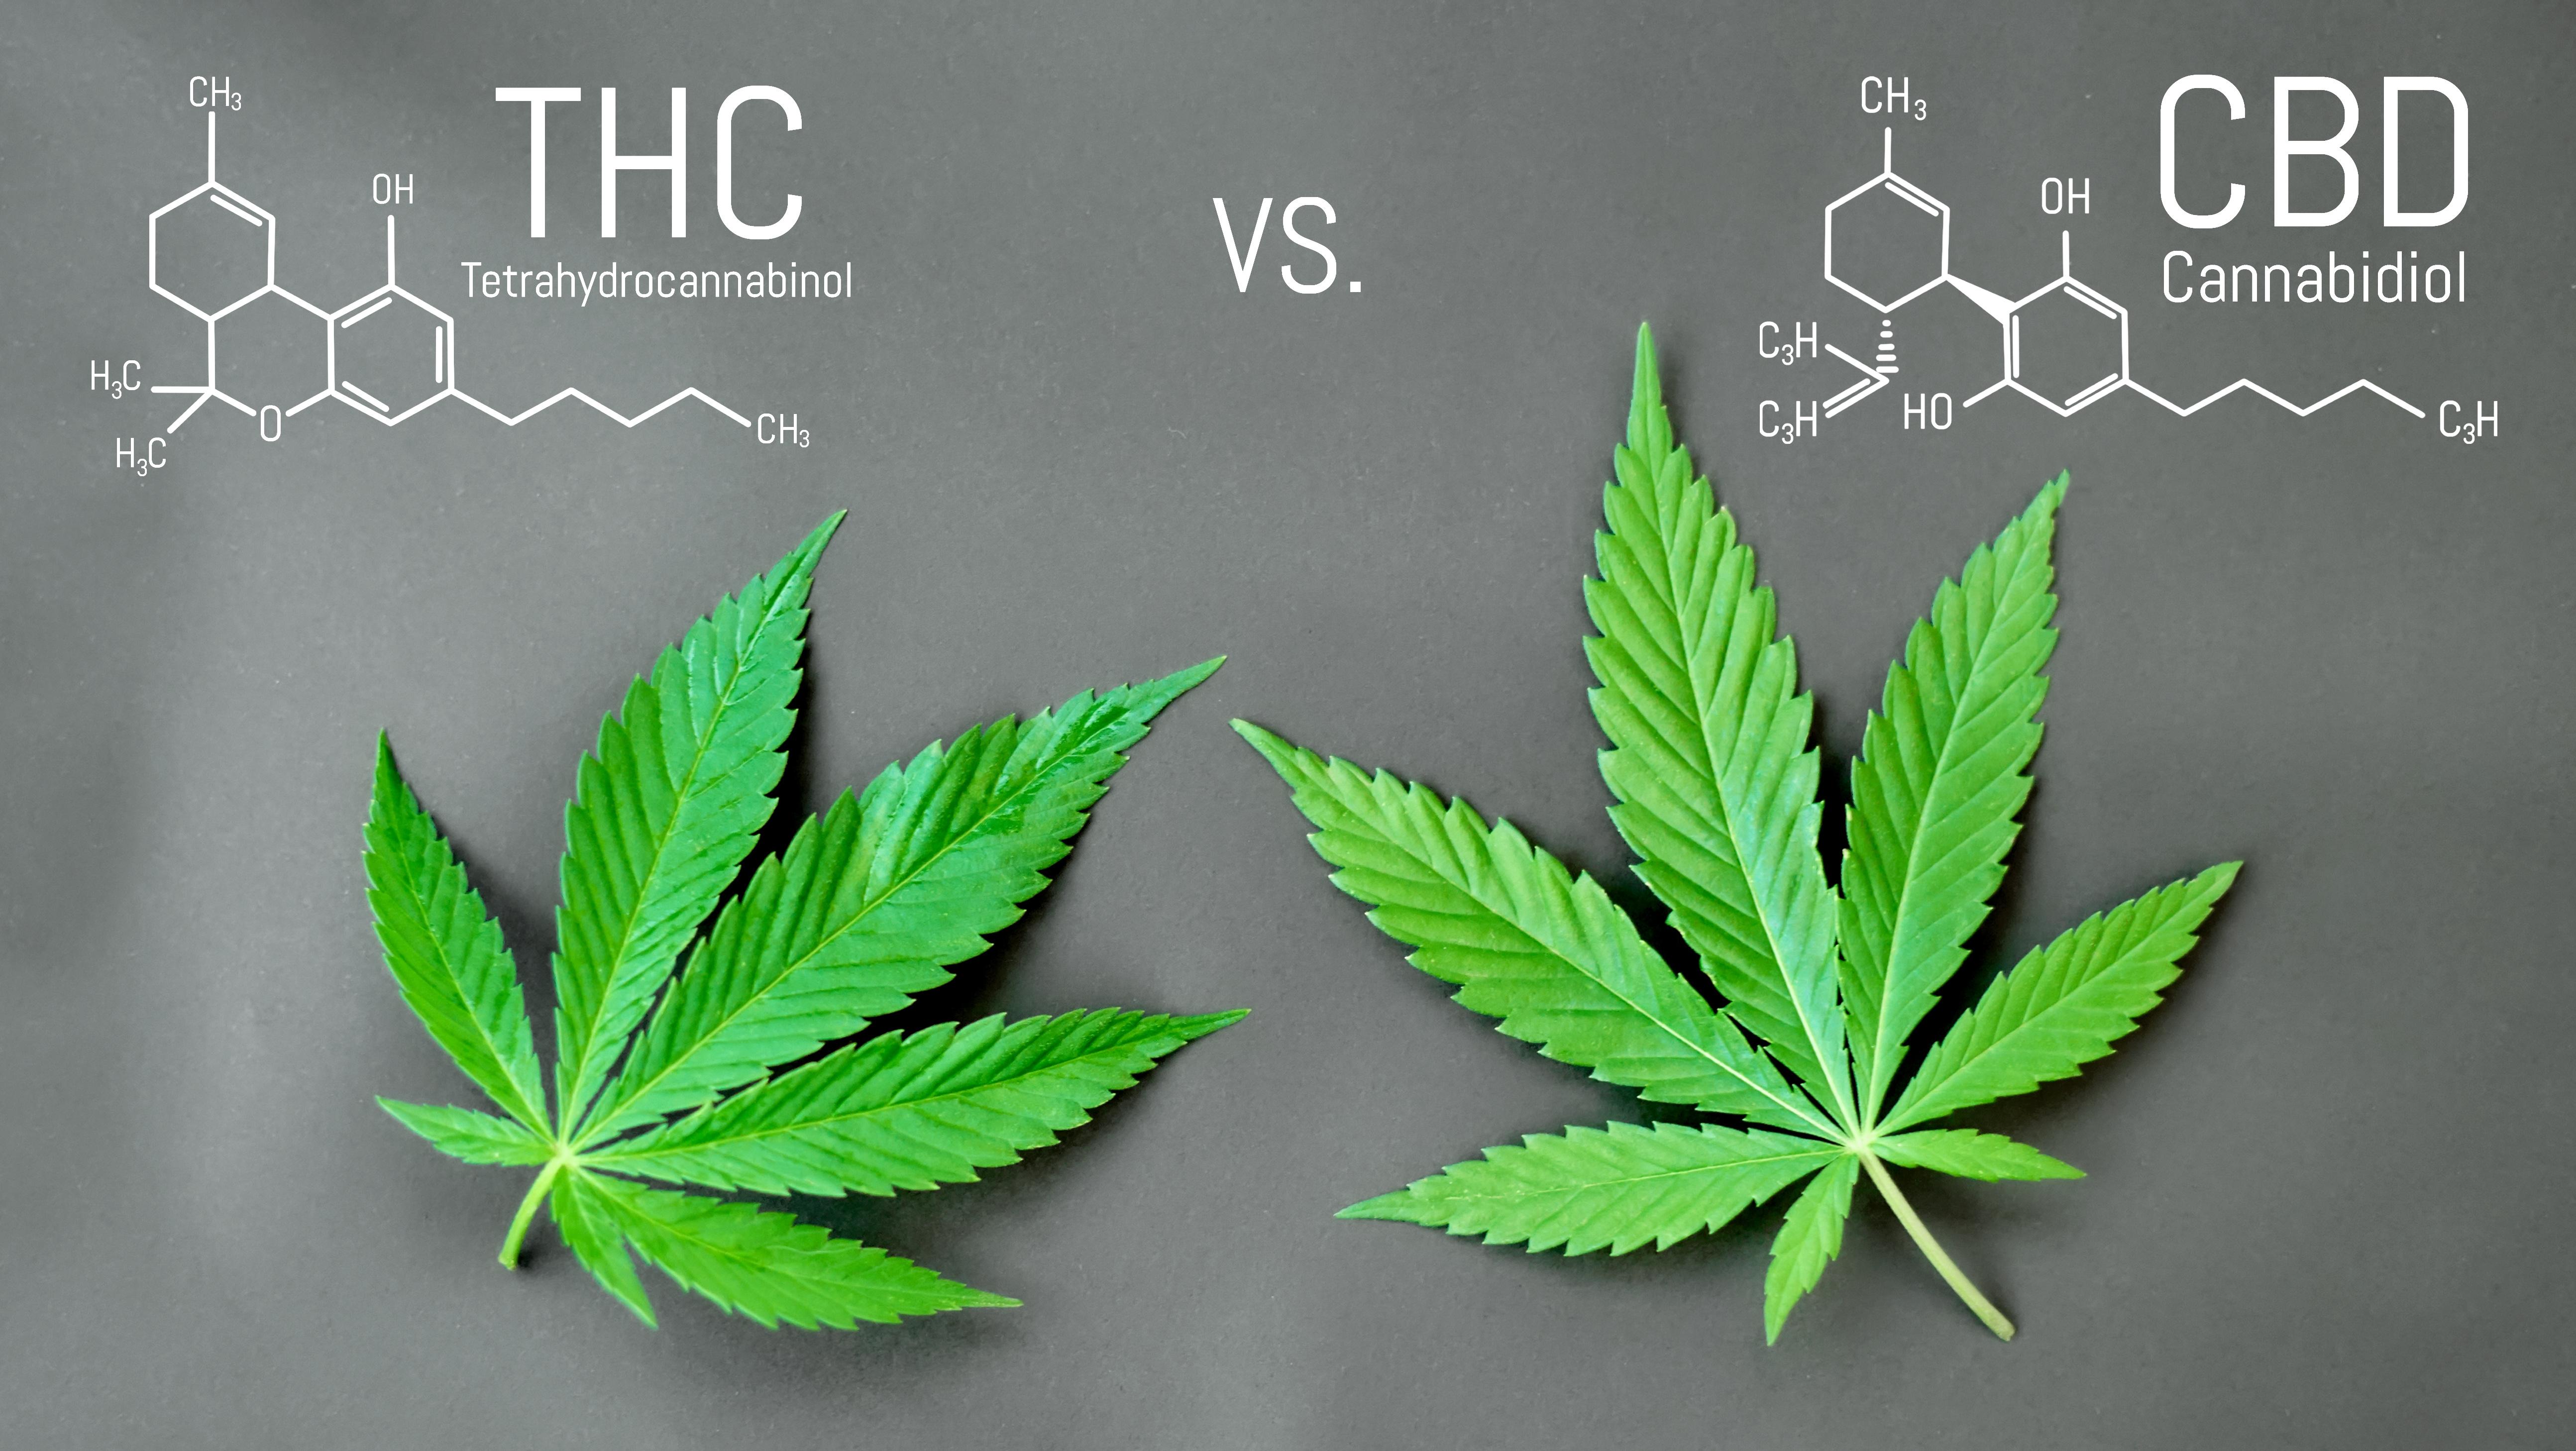 Marijuana SEO organic growth strategies for cannabis business